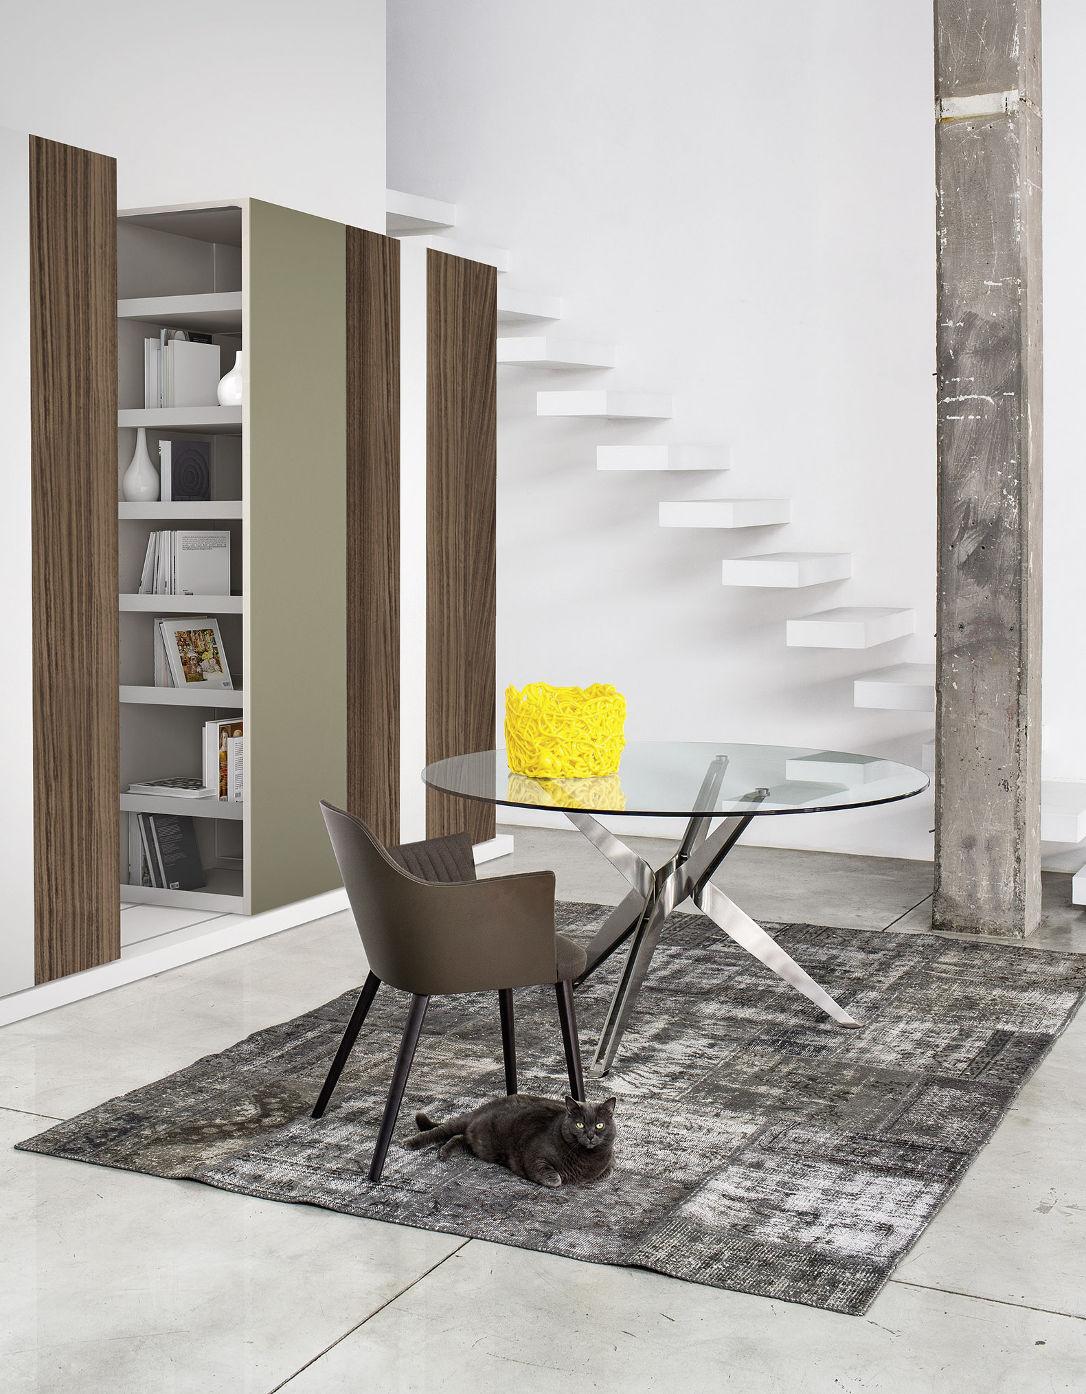 tetris furniture. Previous Next Tetris Furniture